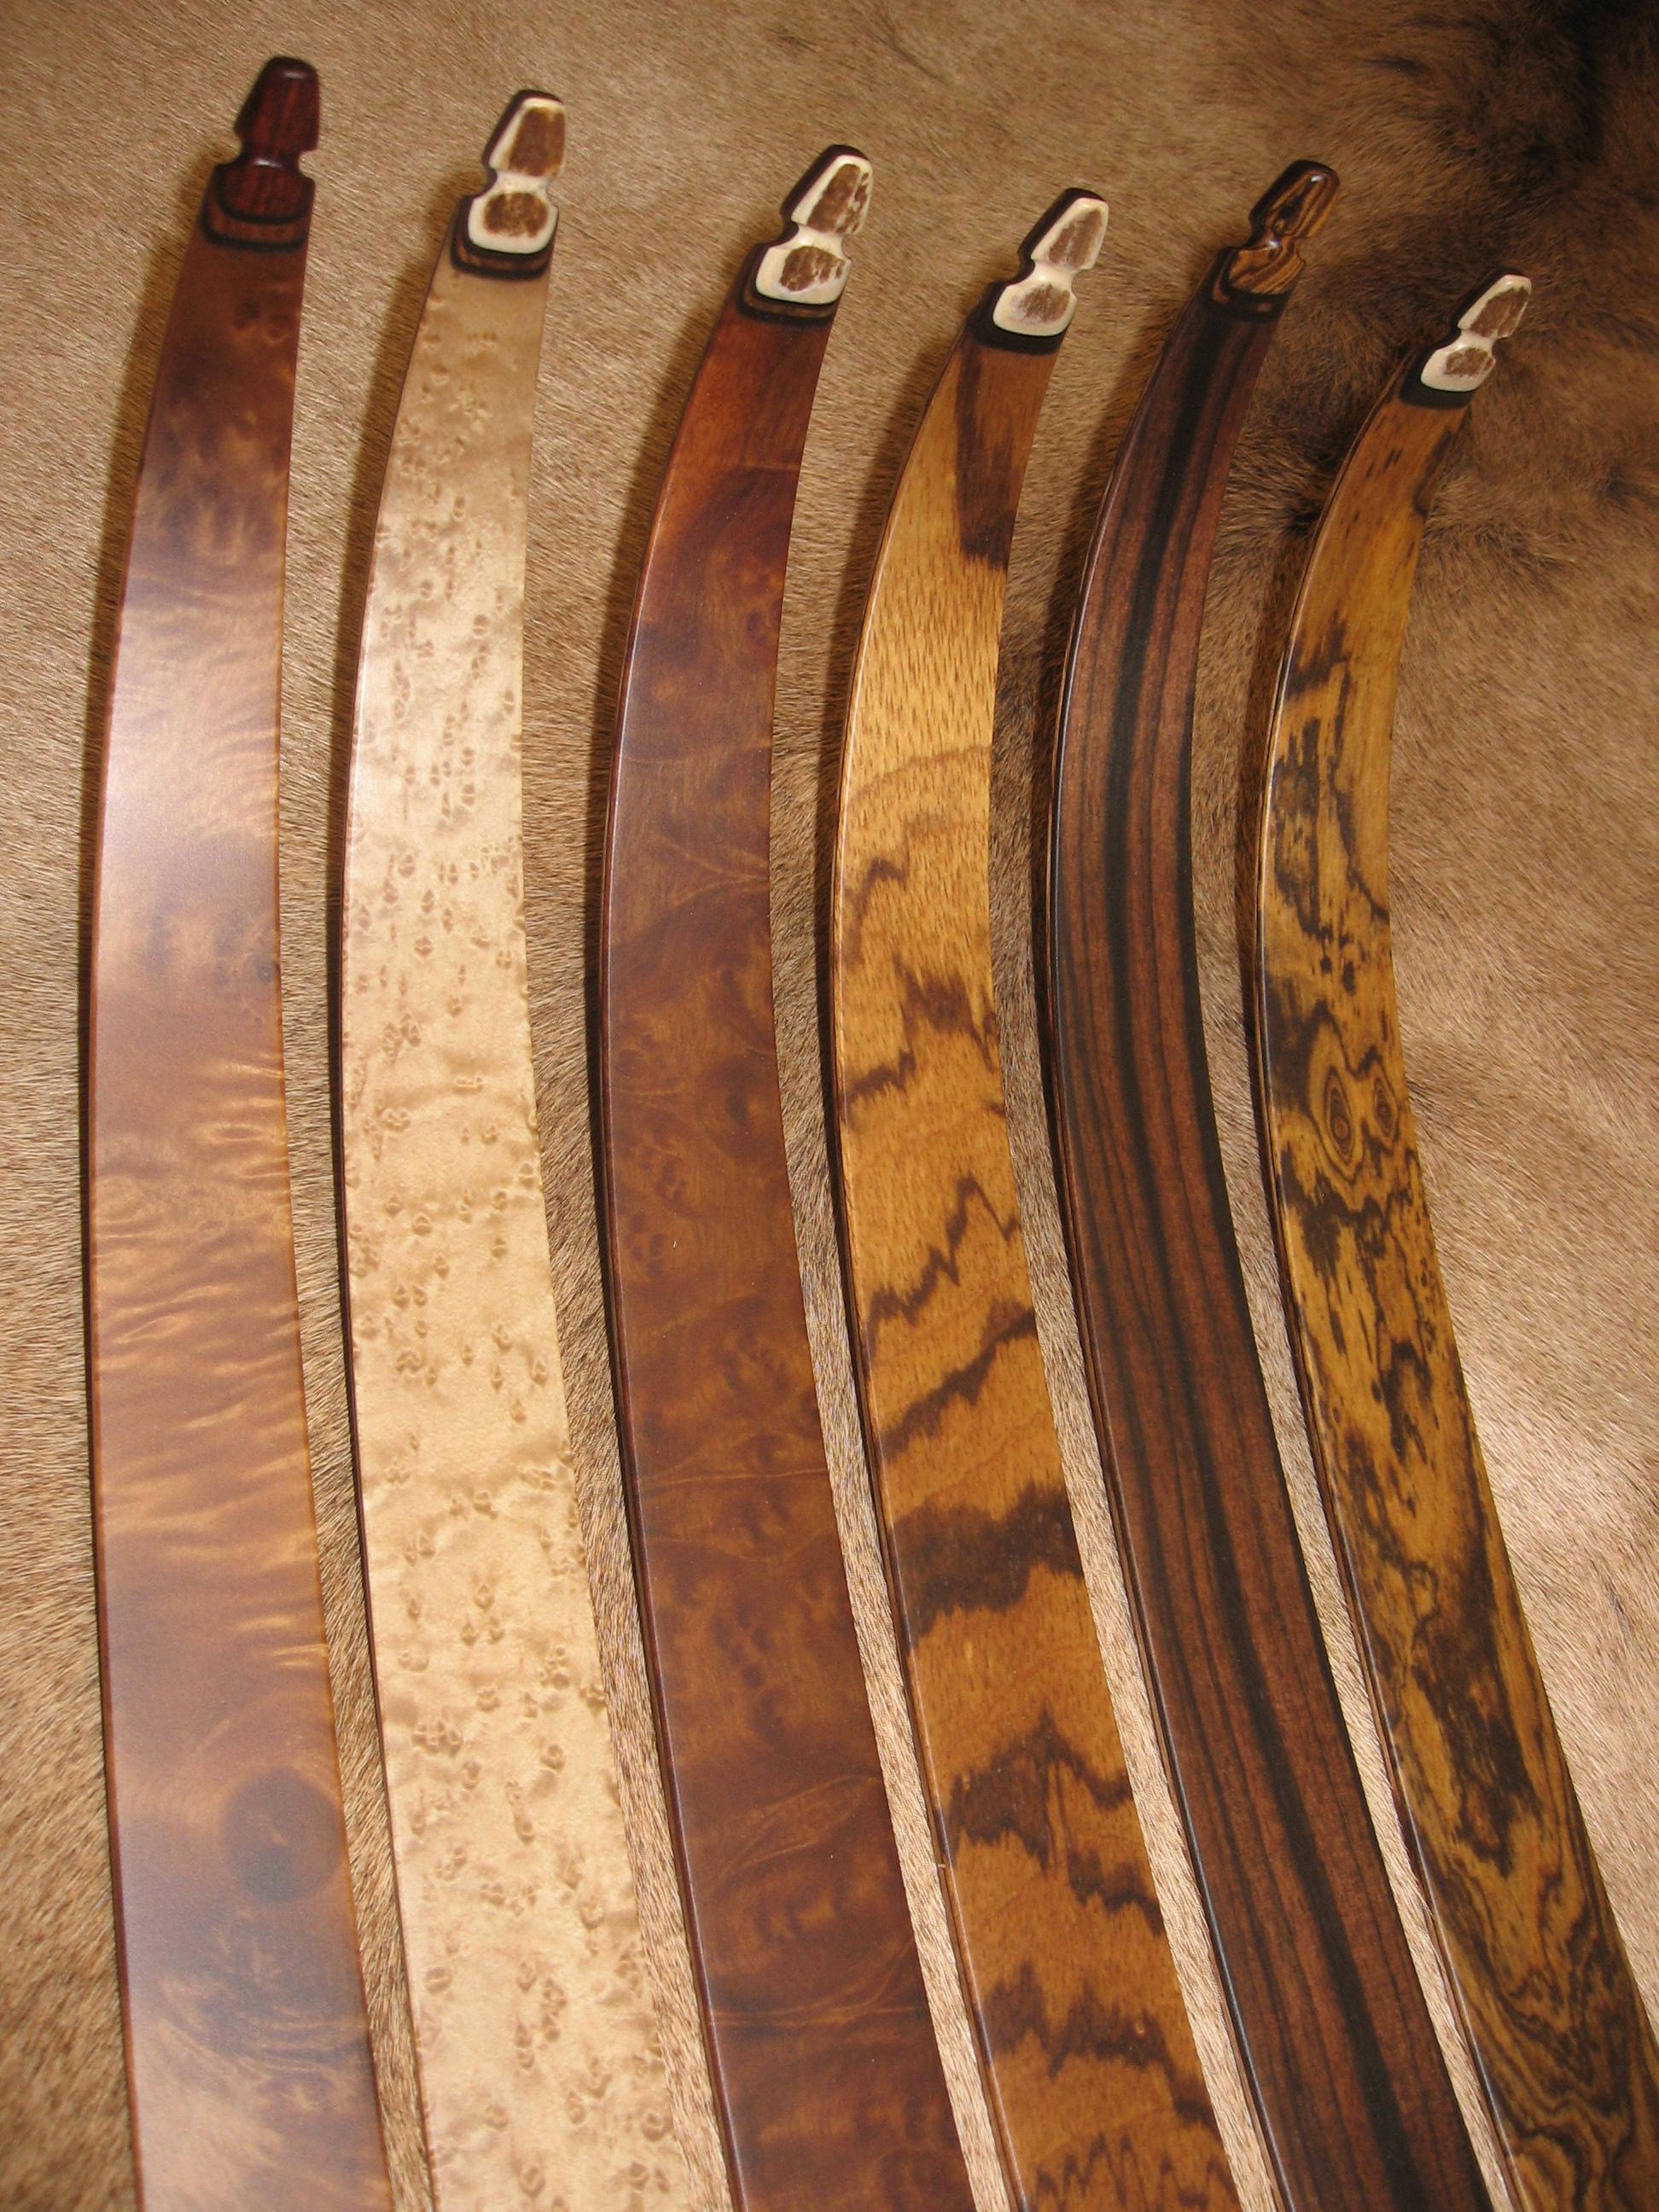 Anglestep Maple, Birdseye Maple, Camphor Burl, Zebrawood, Macassar Ebony, Bocote